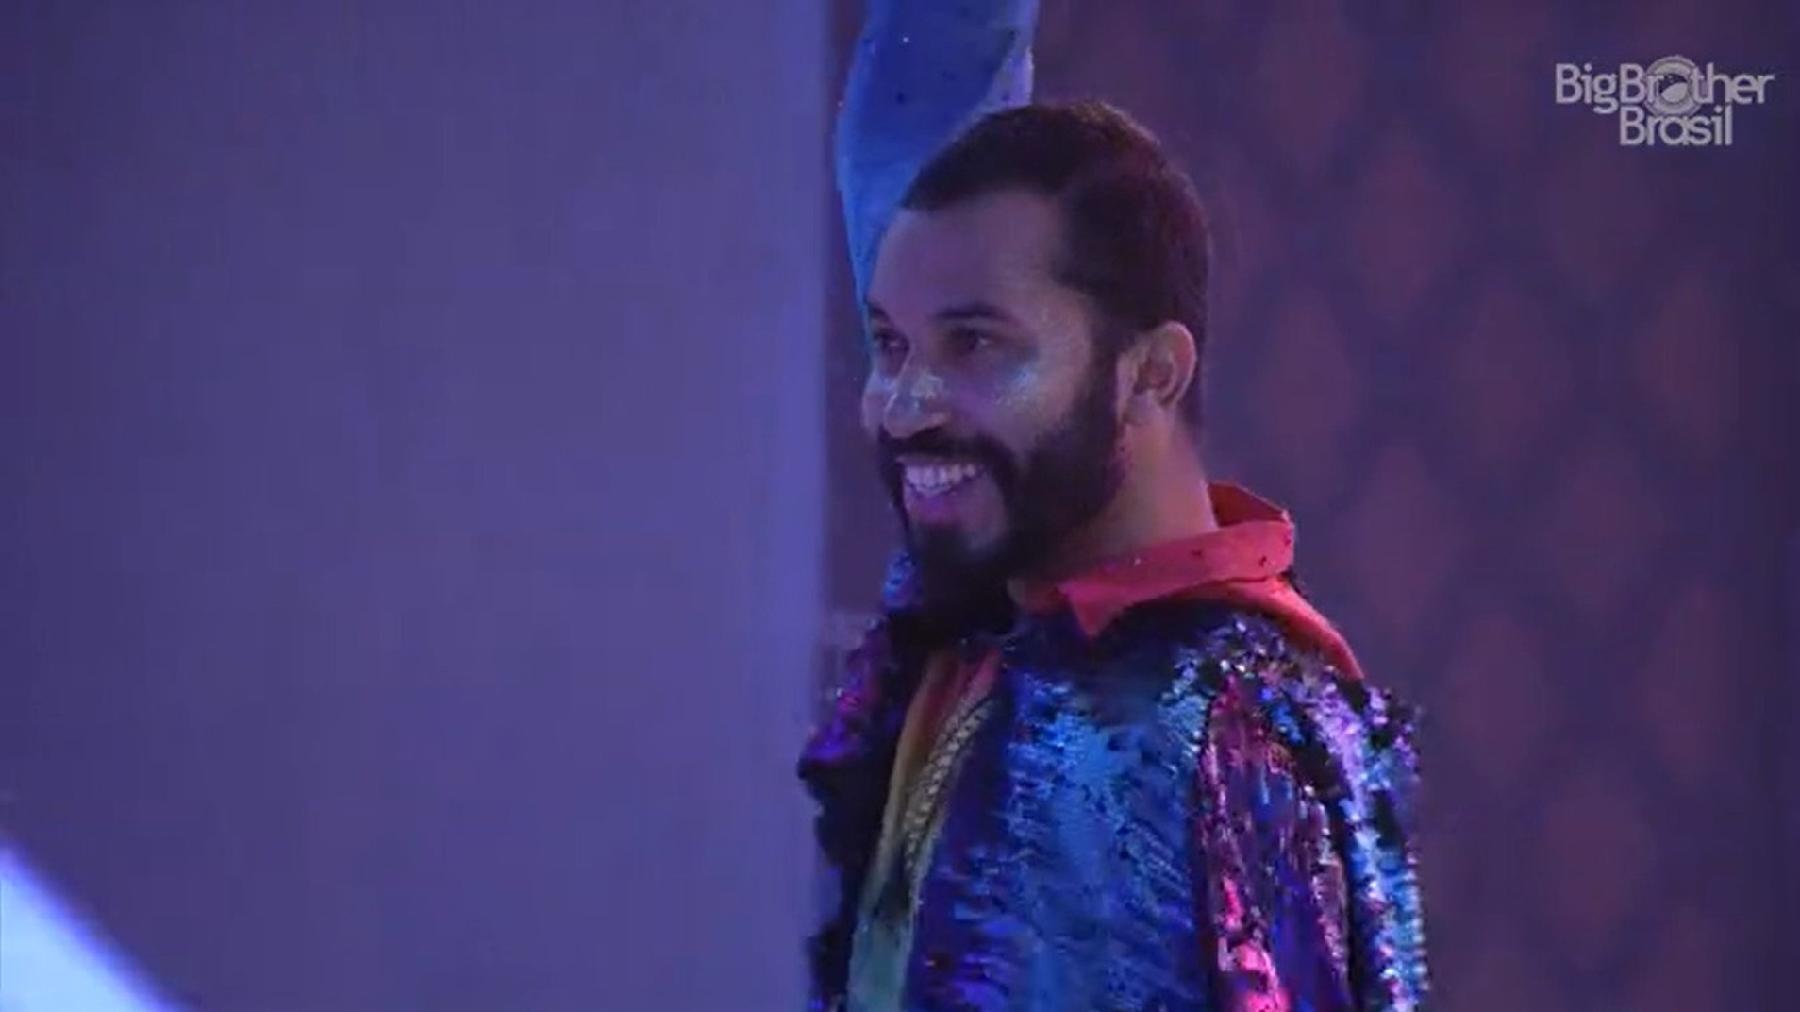 BBB 21: Gilberto na abertura da festa do líder - Reprodução/Globoplay